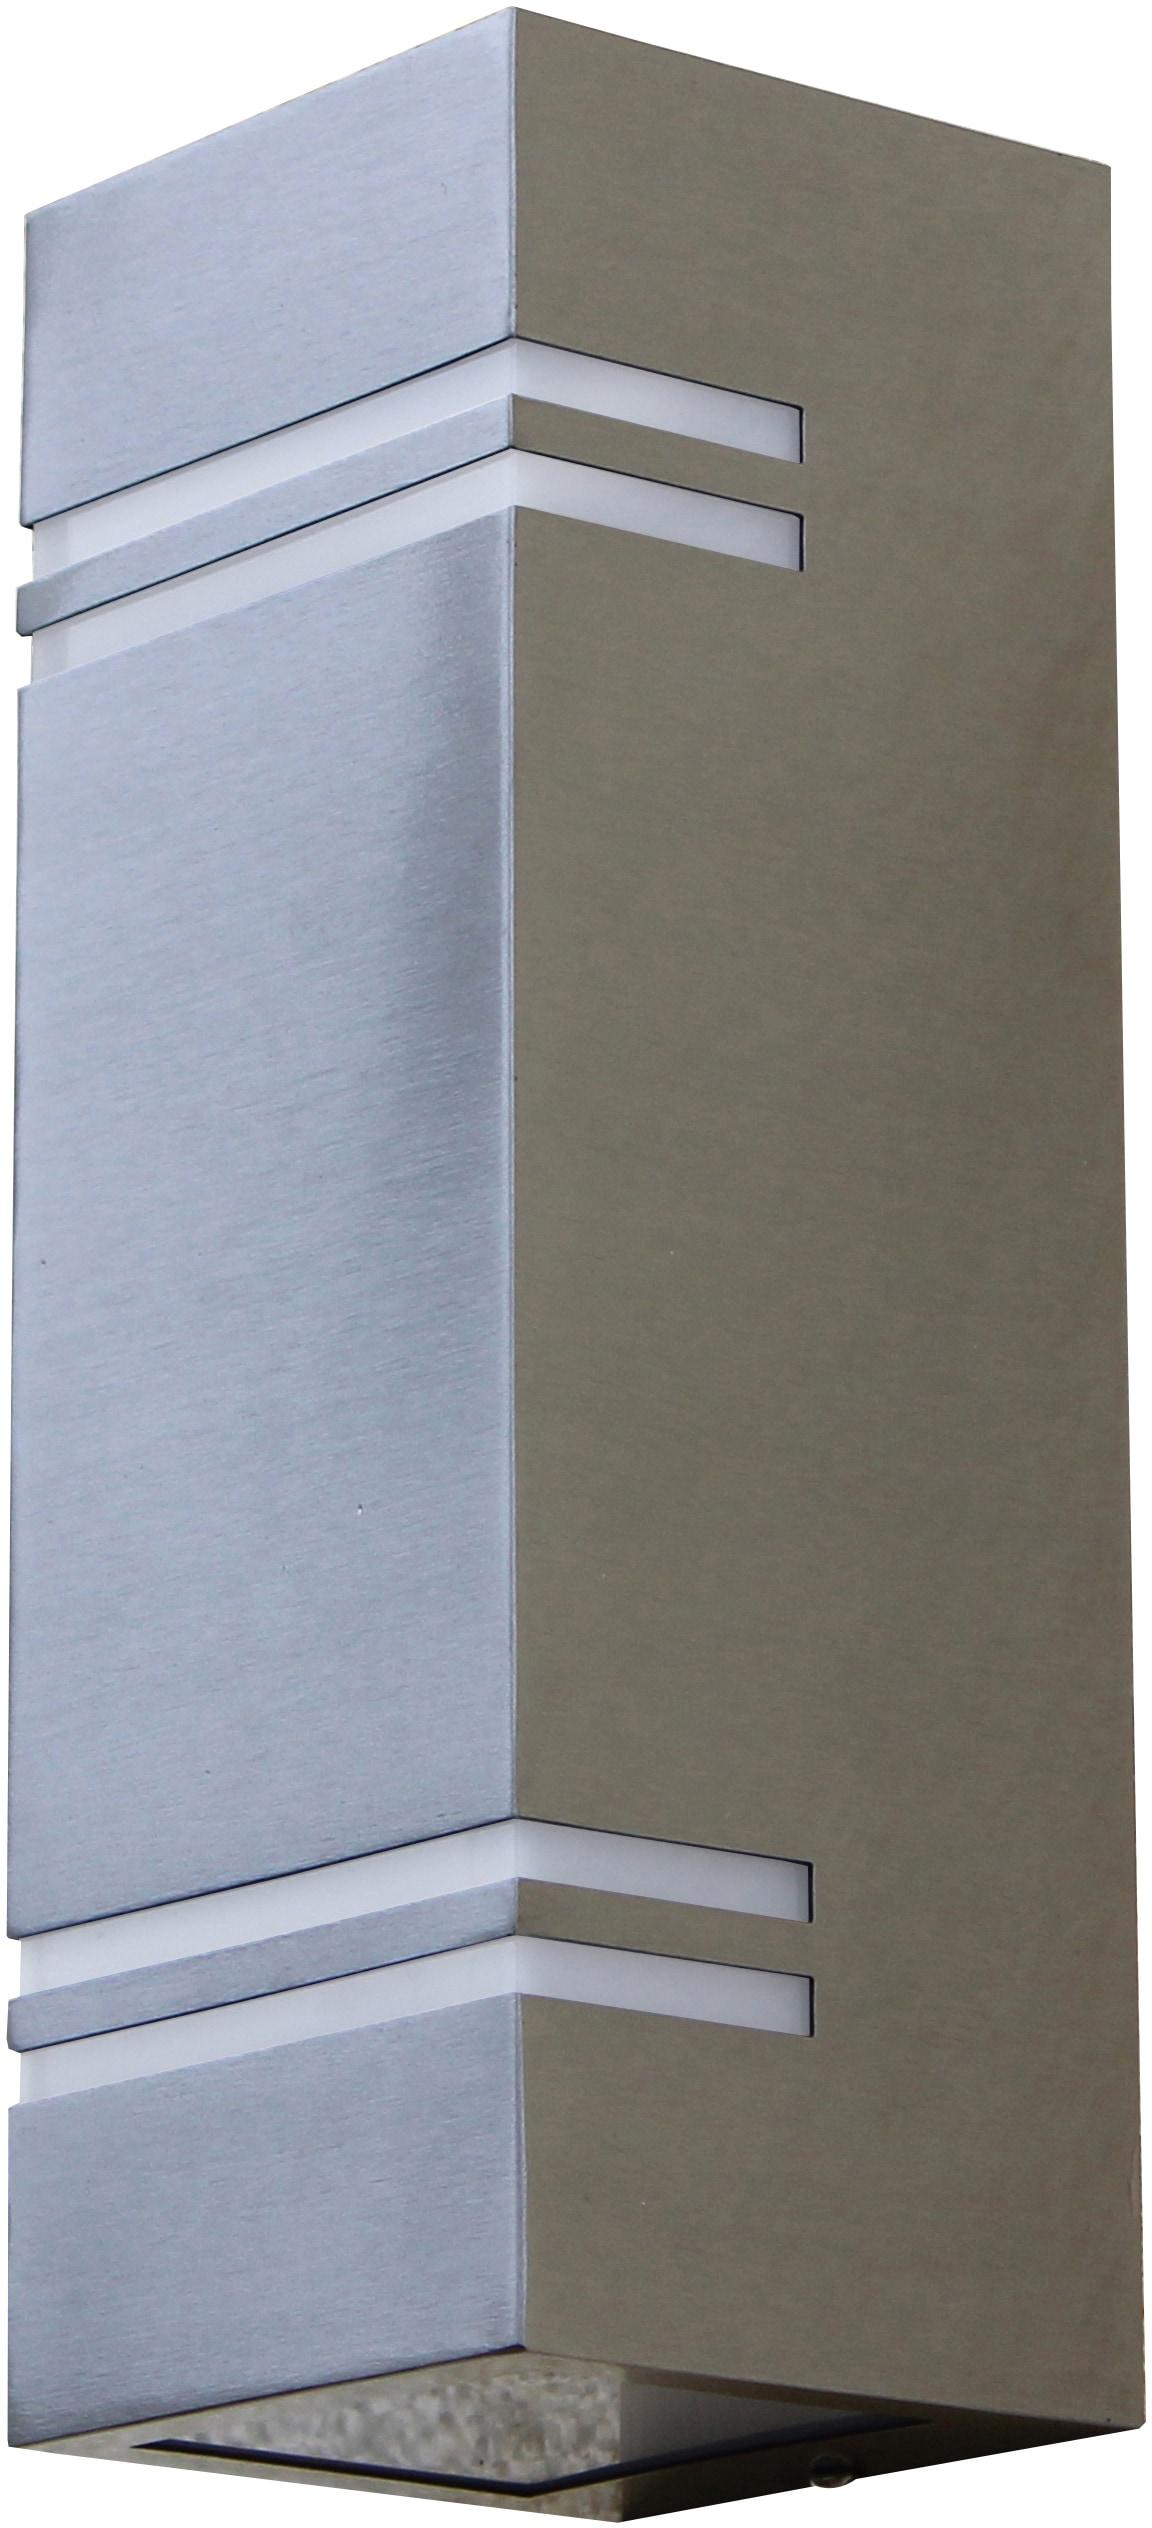 LUTEC LED Außen-Wandleuchte STRIPES ST5003-2, LED-Modul, 1 St., Warmweiß